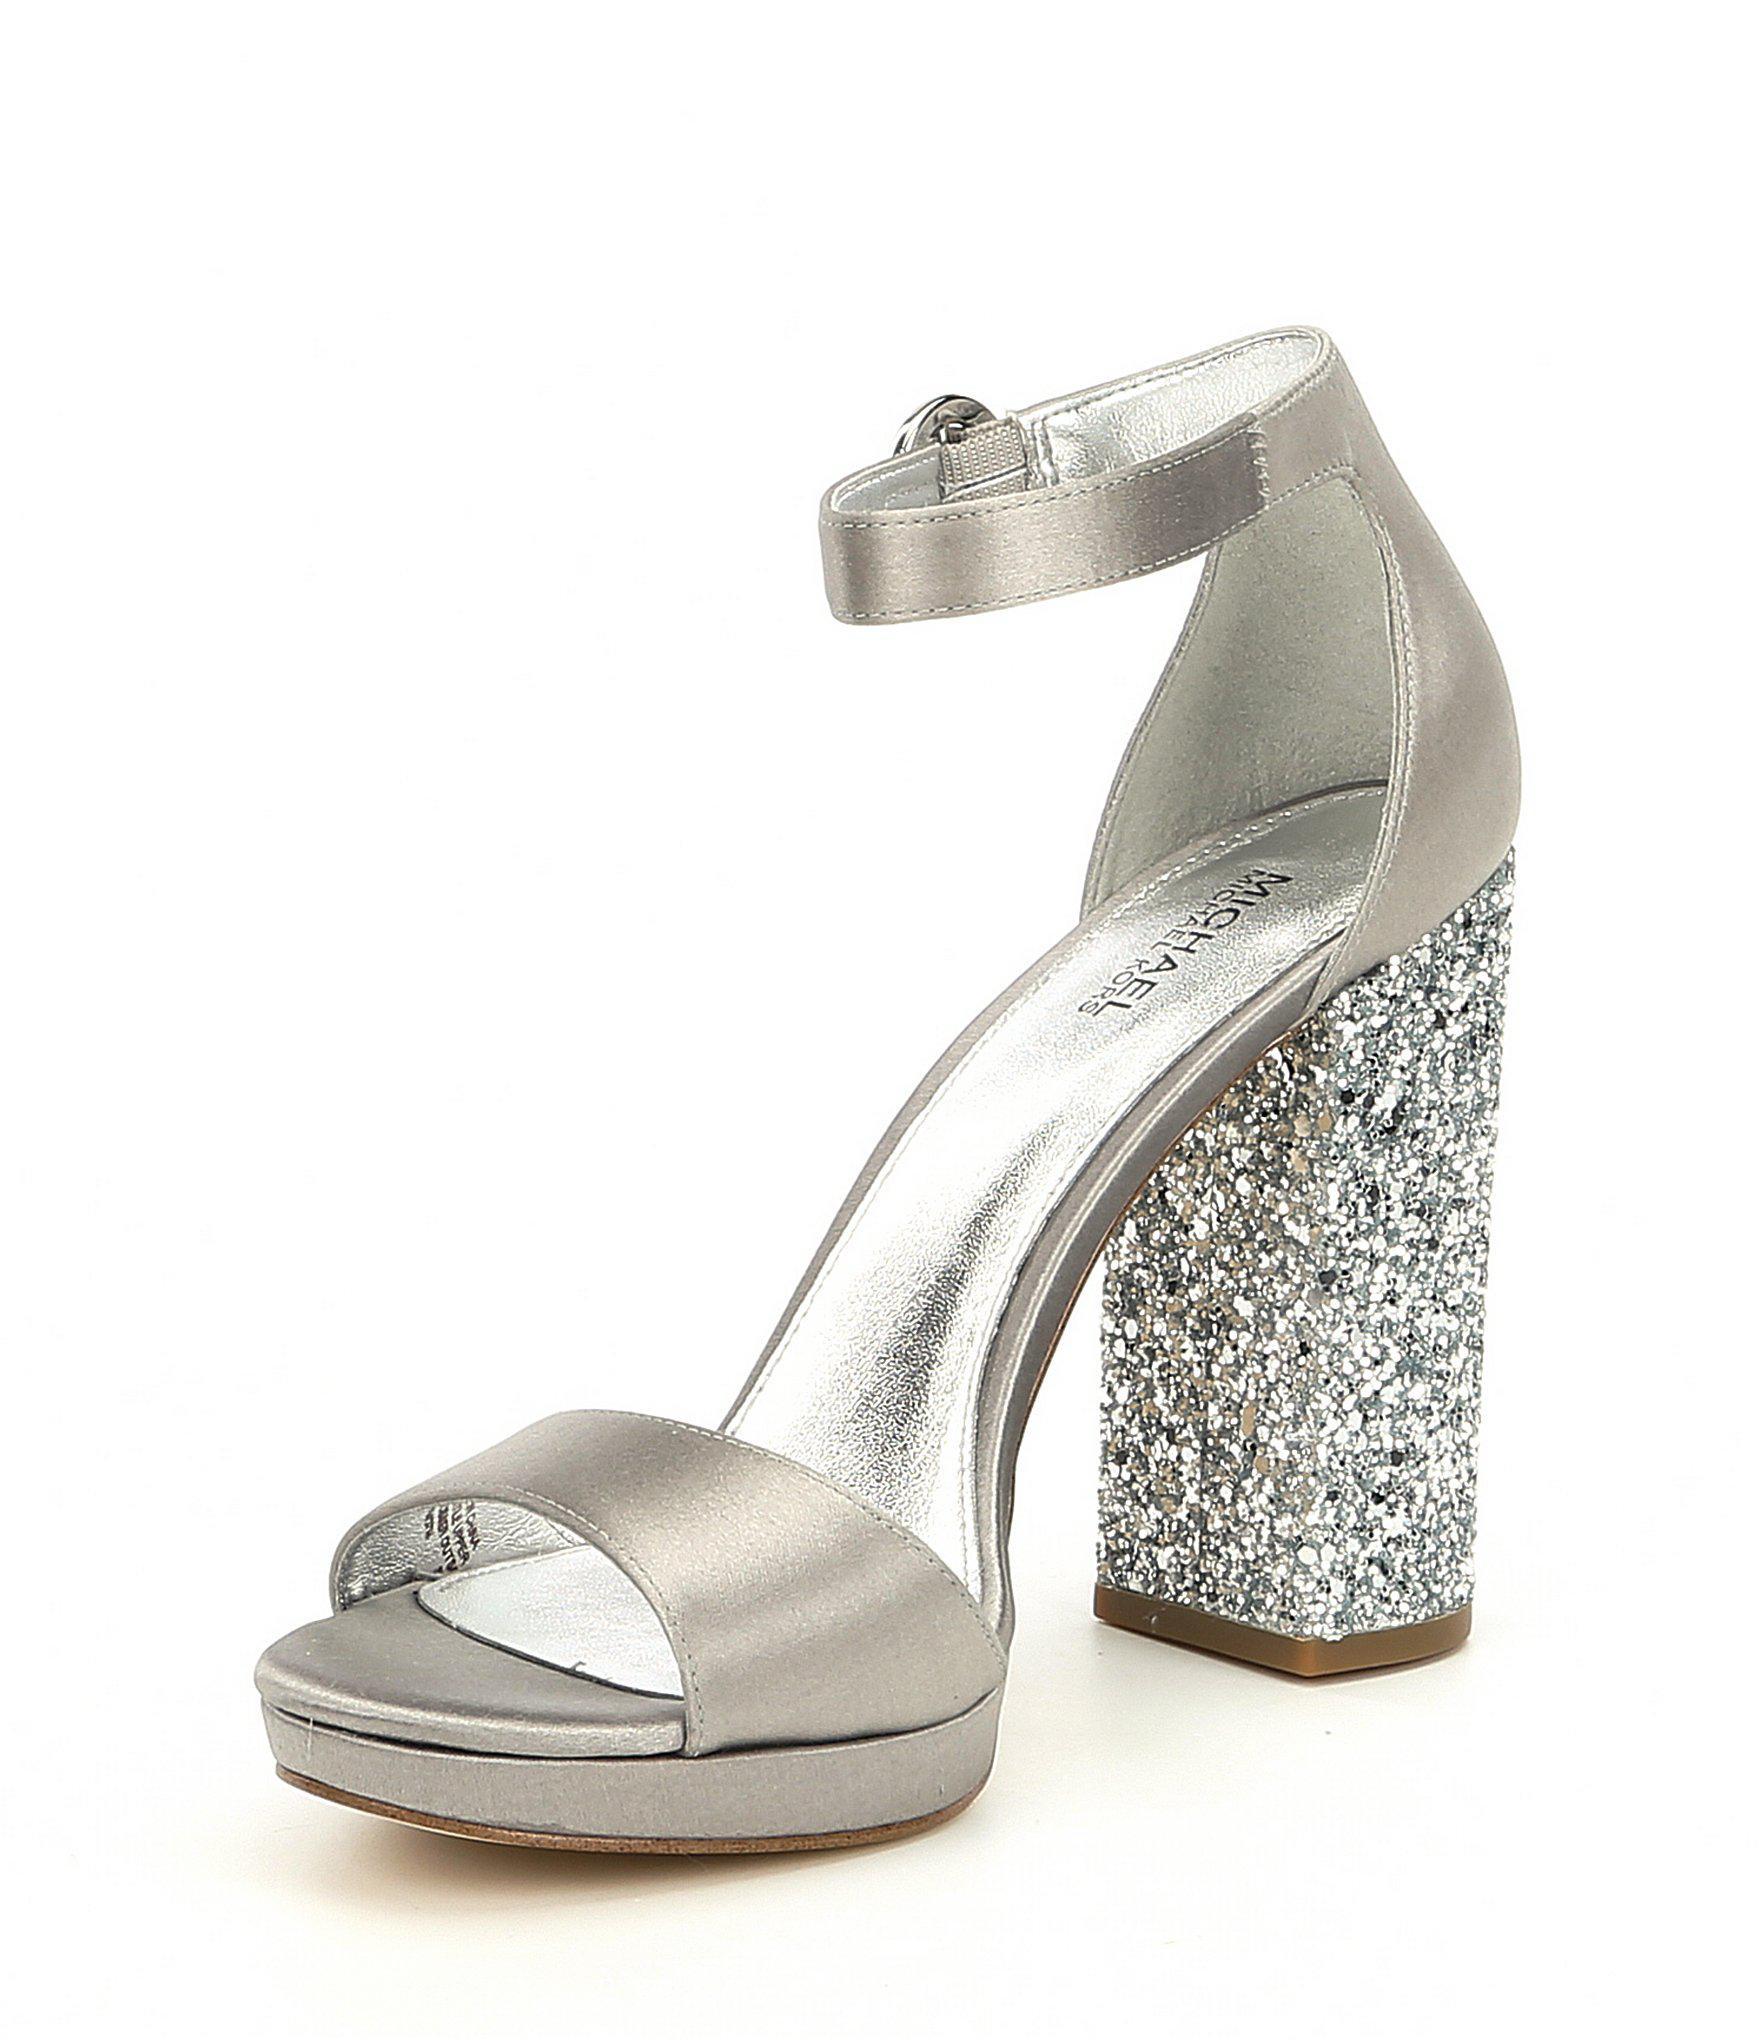 57e6dfea73a Lyst - MICHAEL Michael Kors Erika Satin Glitter Block Heel Dress ...